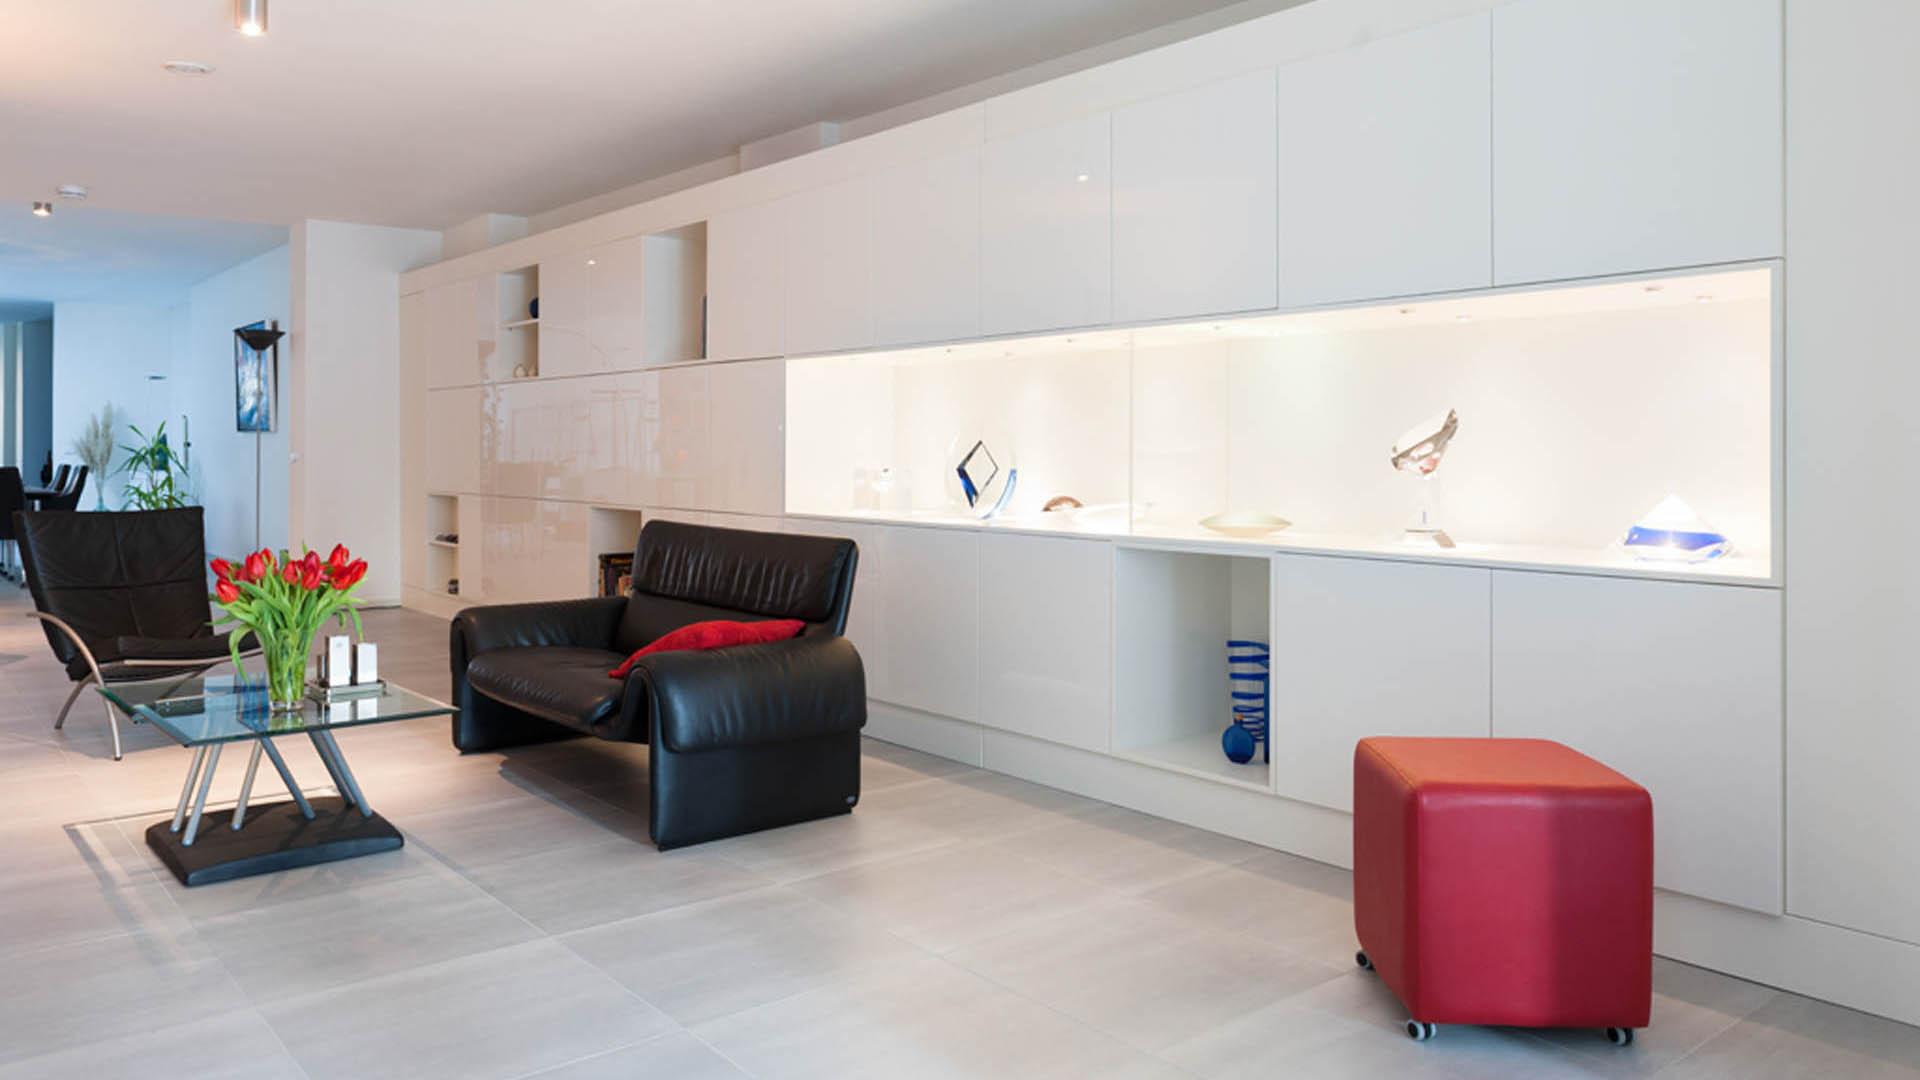 architectuur-delft-renovatie-interieur-transformatie-12 | Studio D11